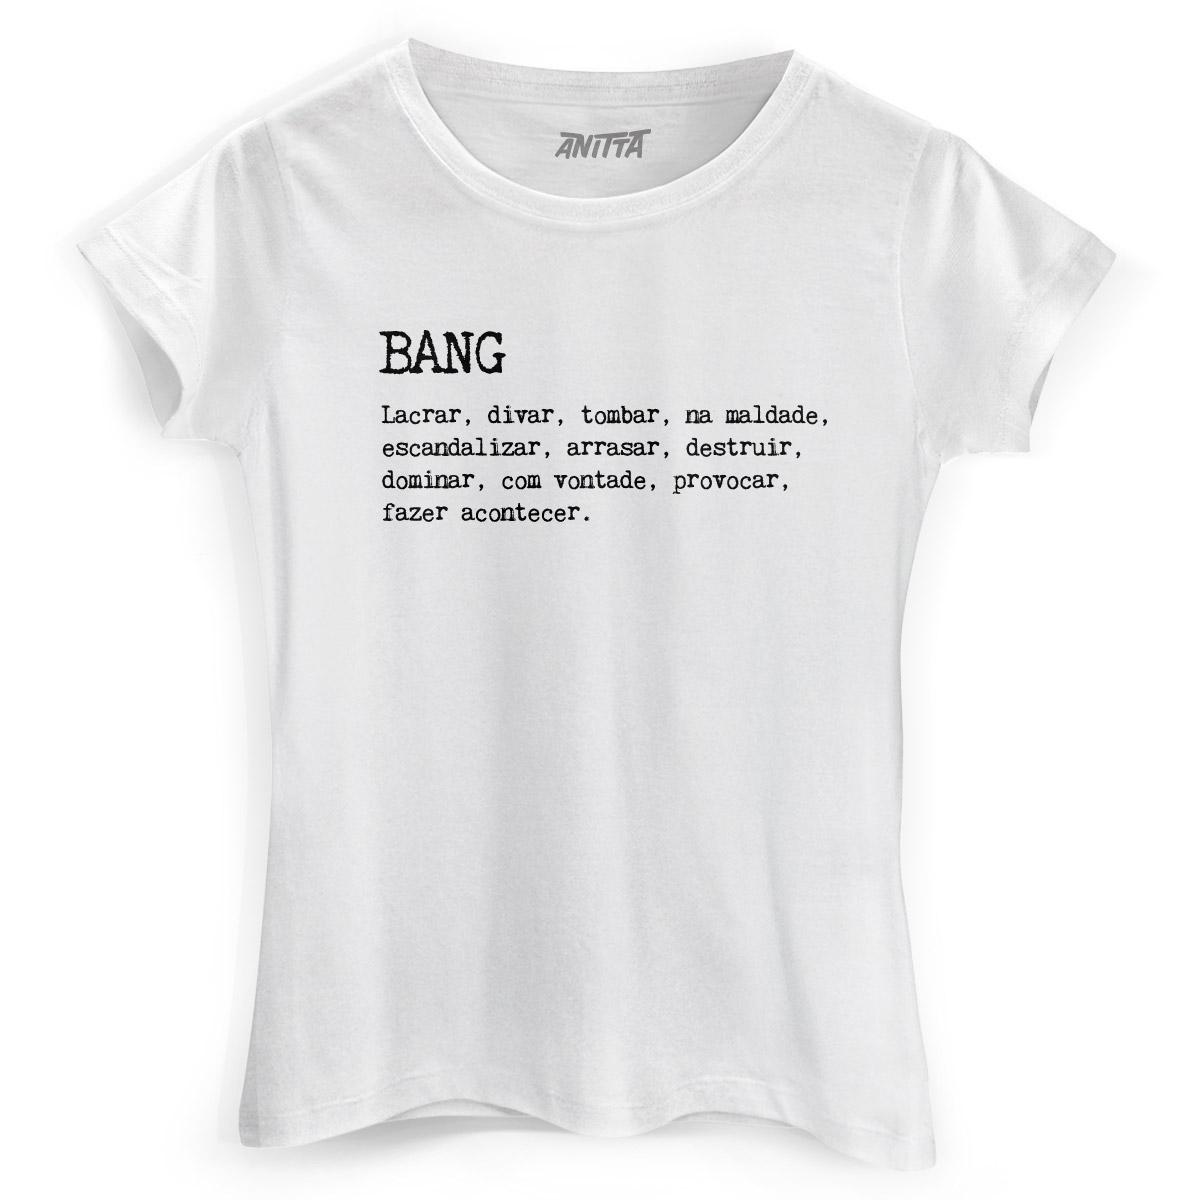 Camiseta Feminina Anitta This is Bang